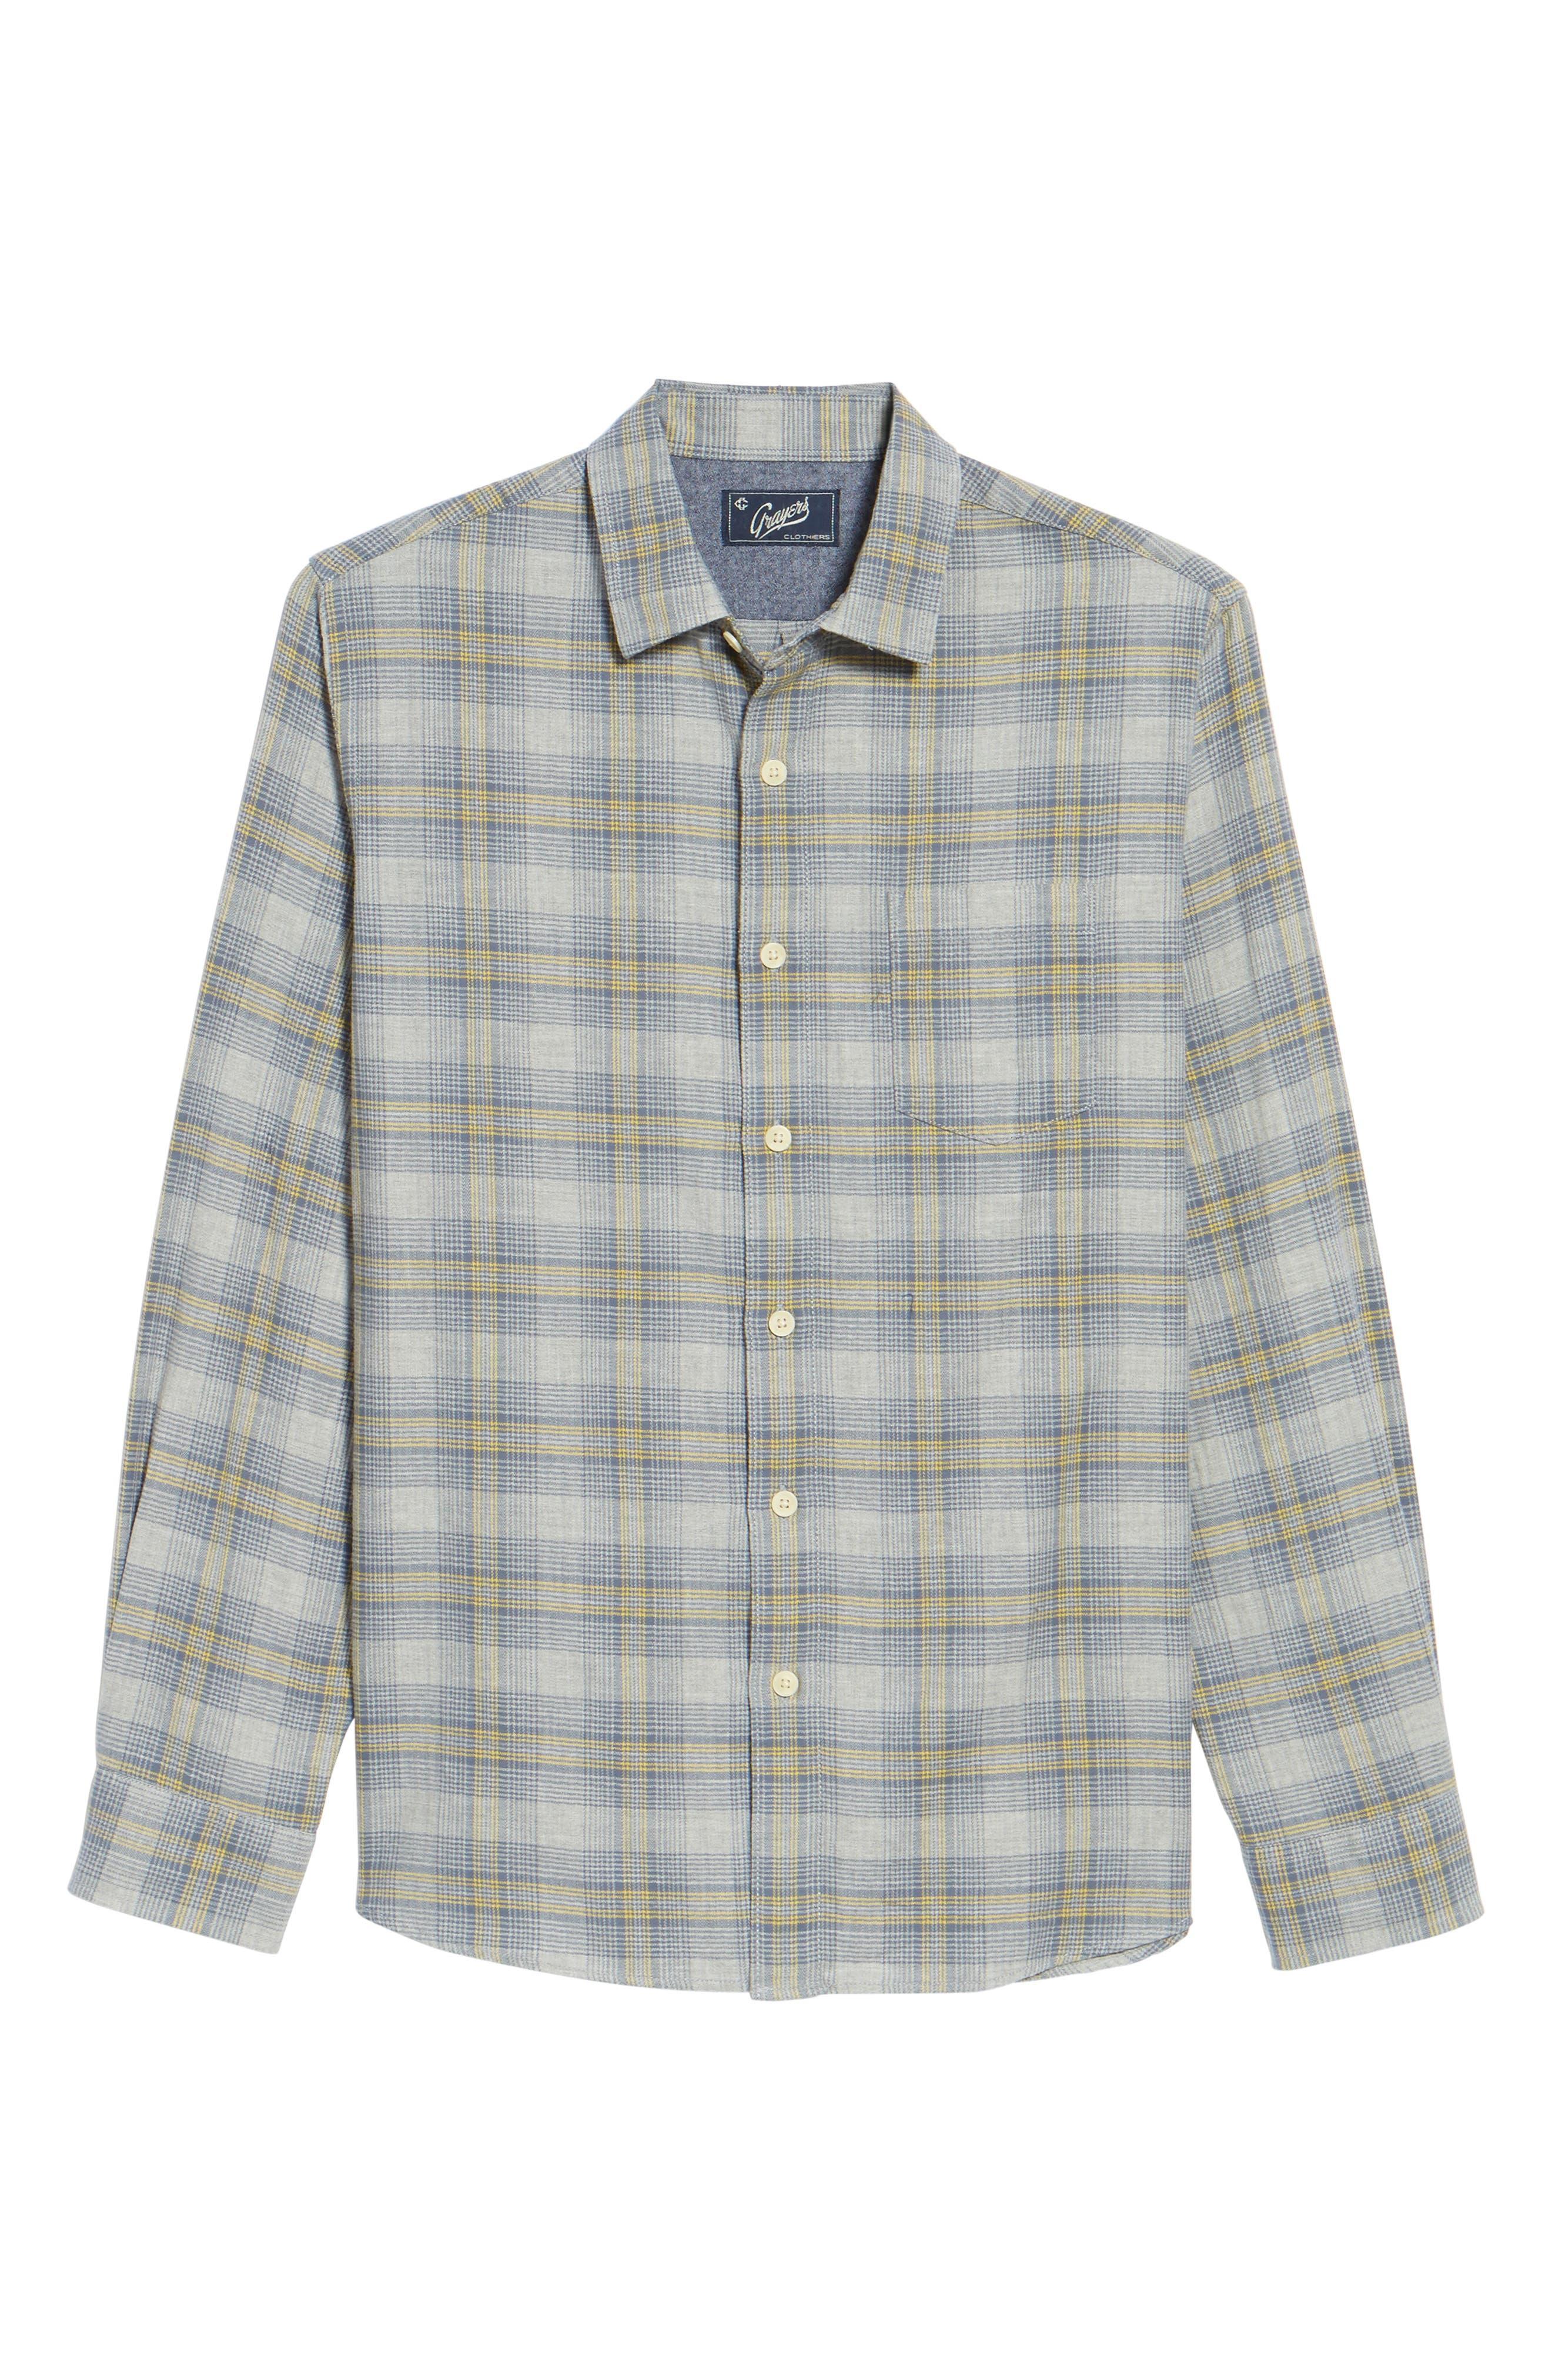 Laugna Herringbone Twill Shirt,                             Alternate thumbnail 6, color,                             032